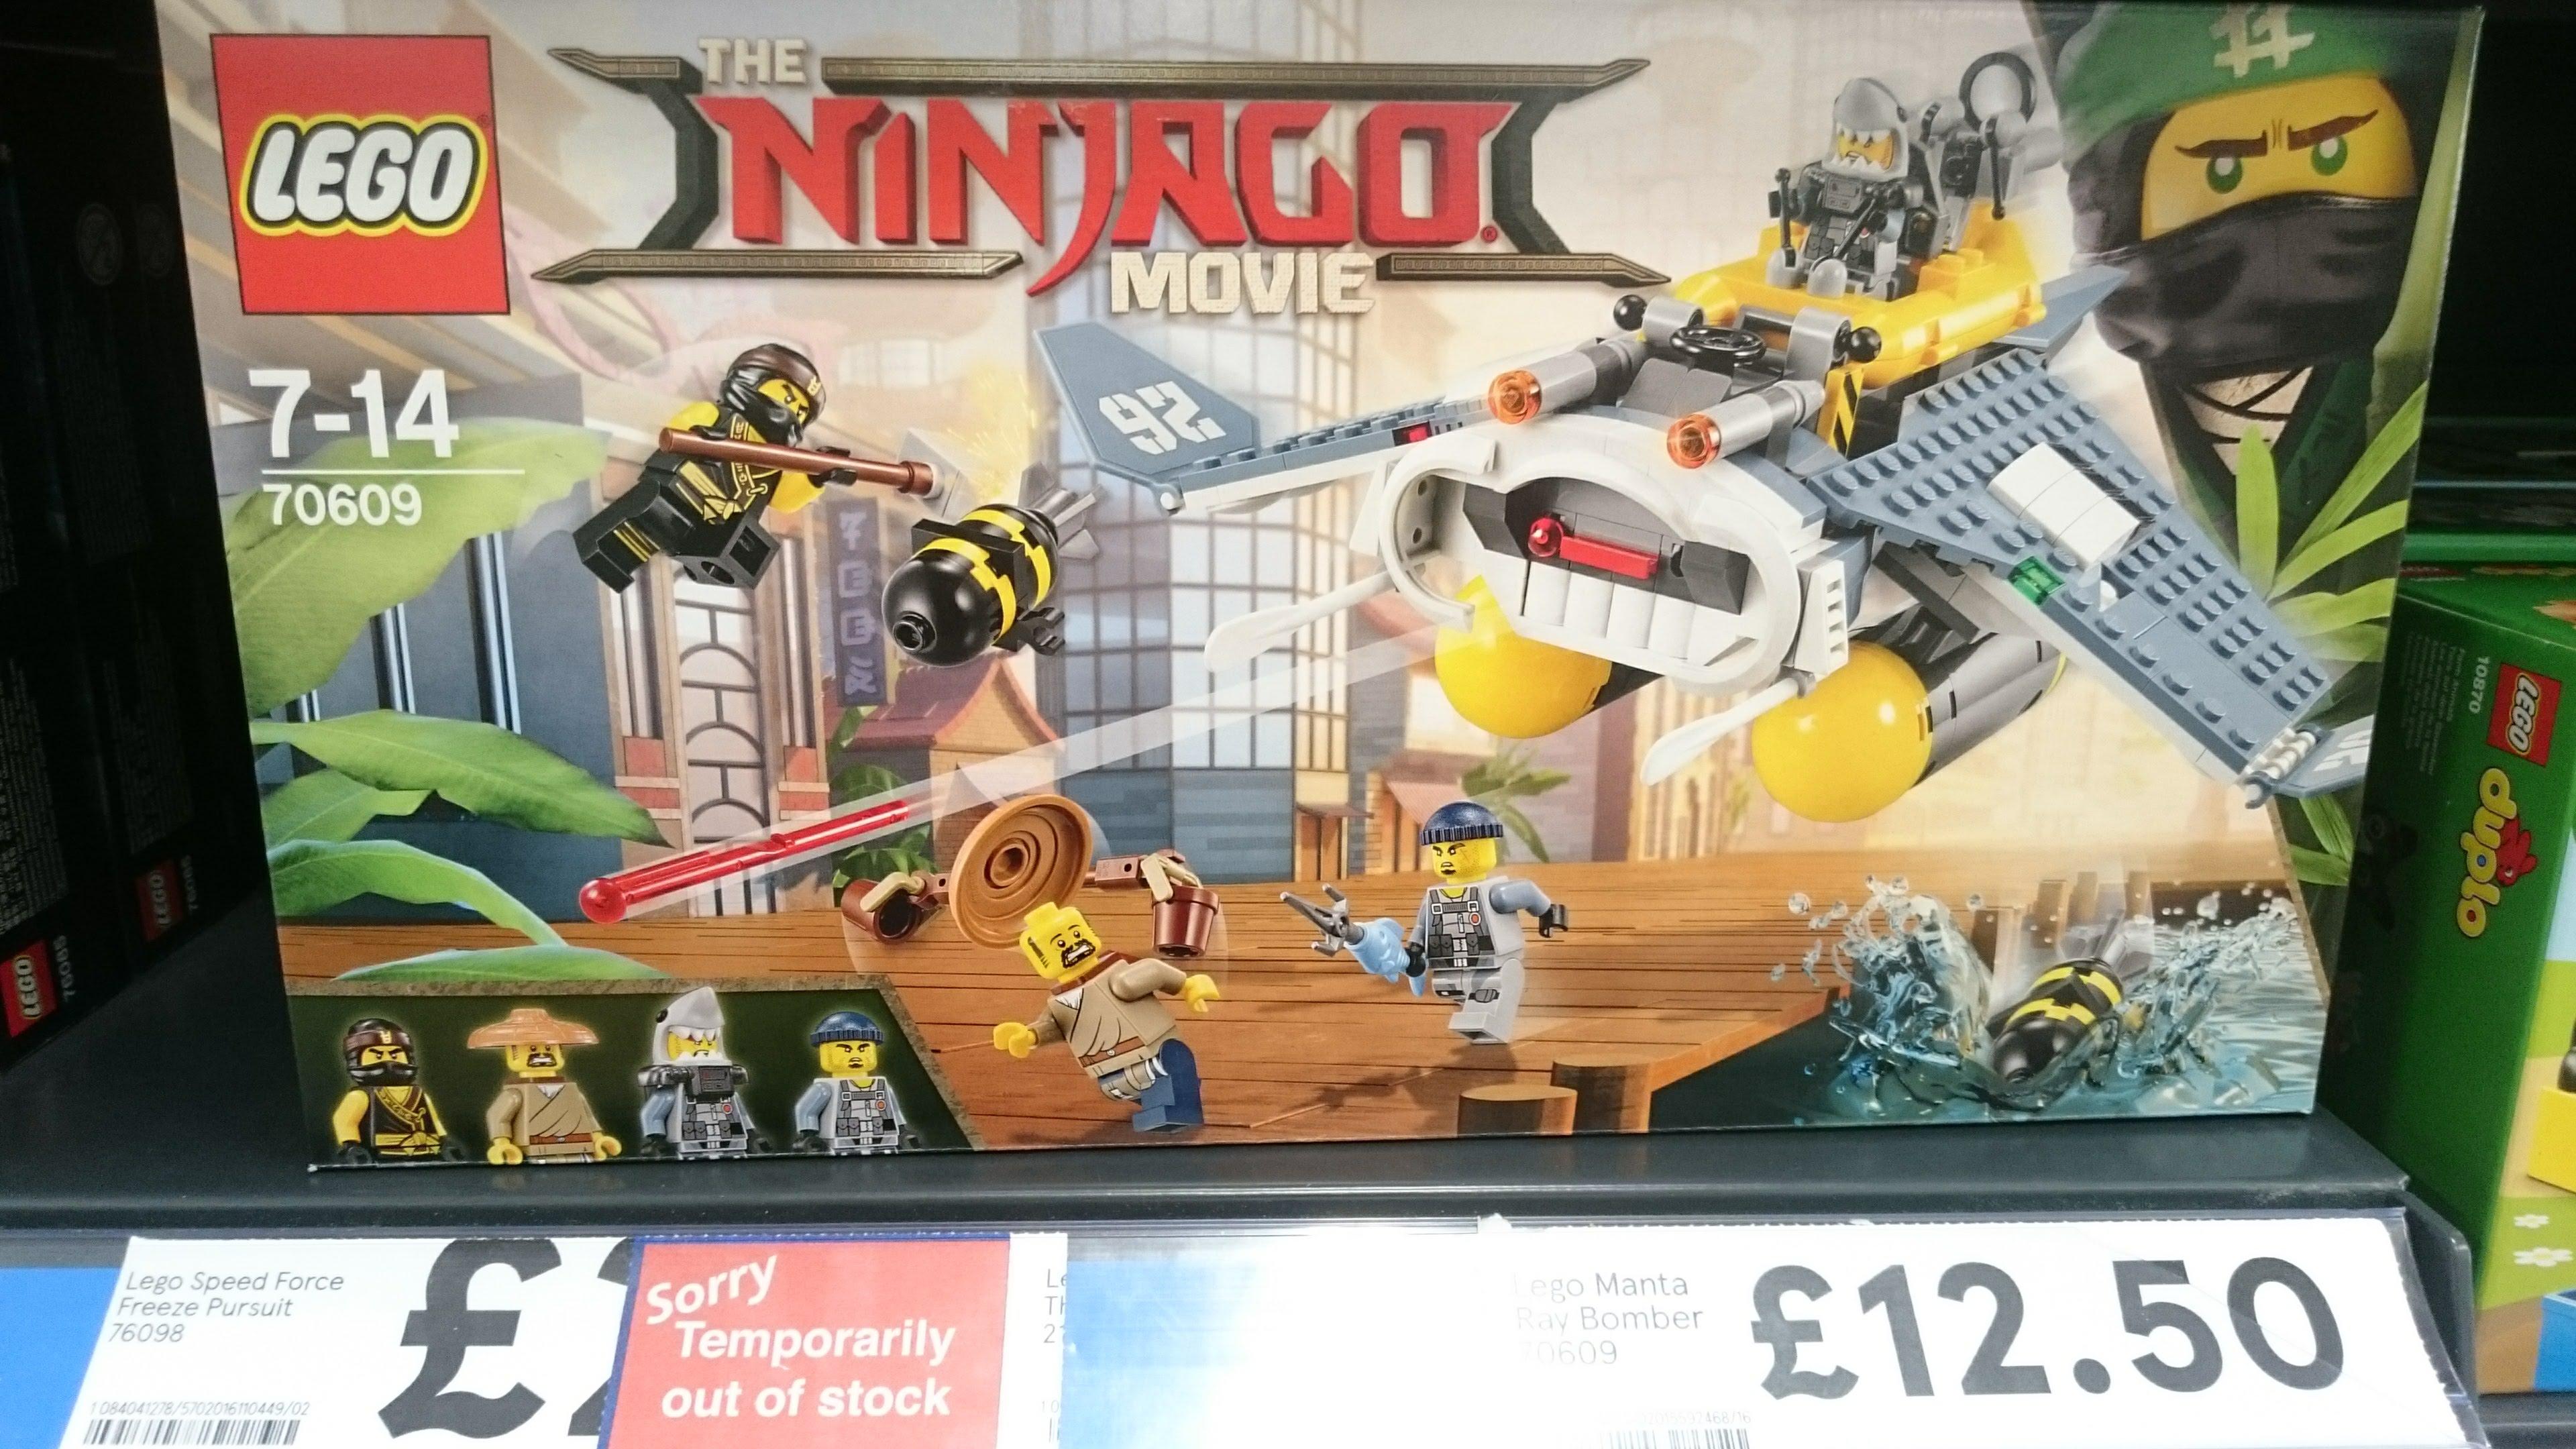 LEGO 70609 Ninjago Manta Ray Bomber £12.50 Tesco INSTORE Long Eaton, Nottingham